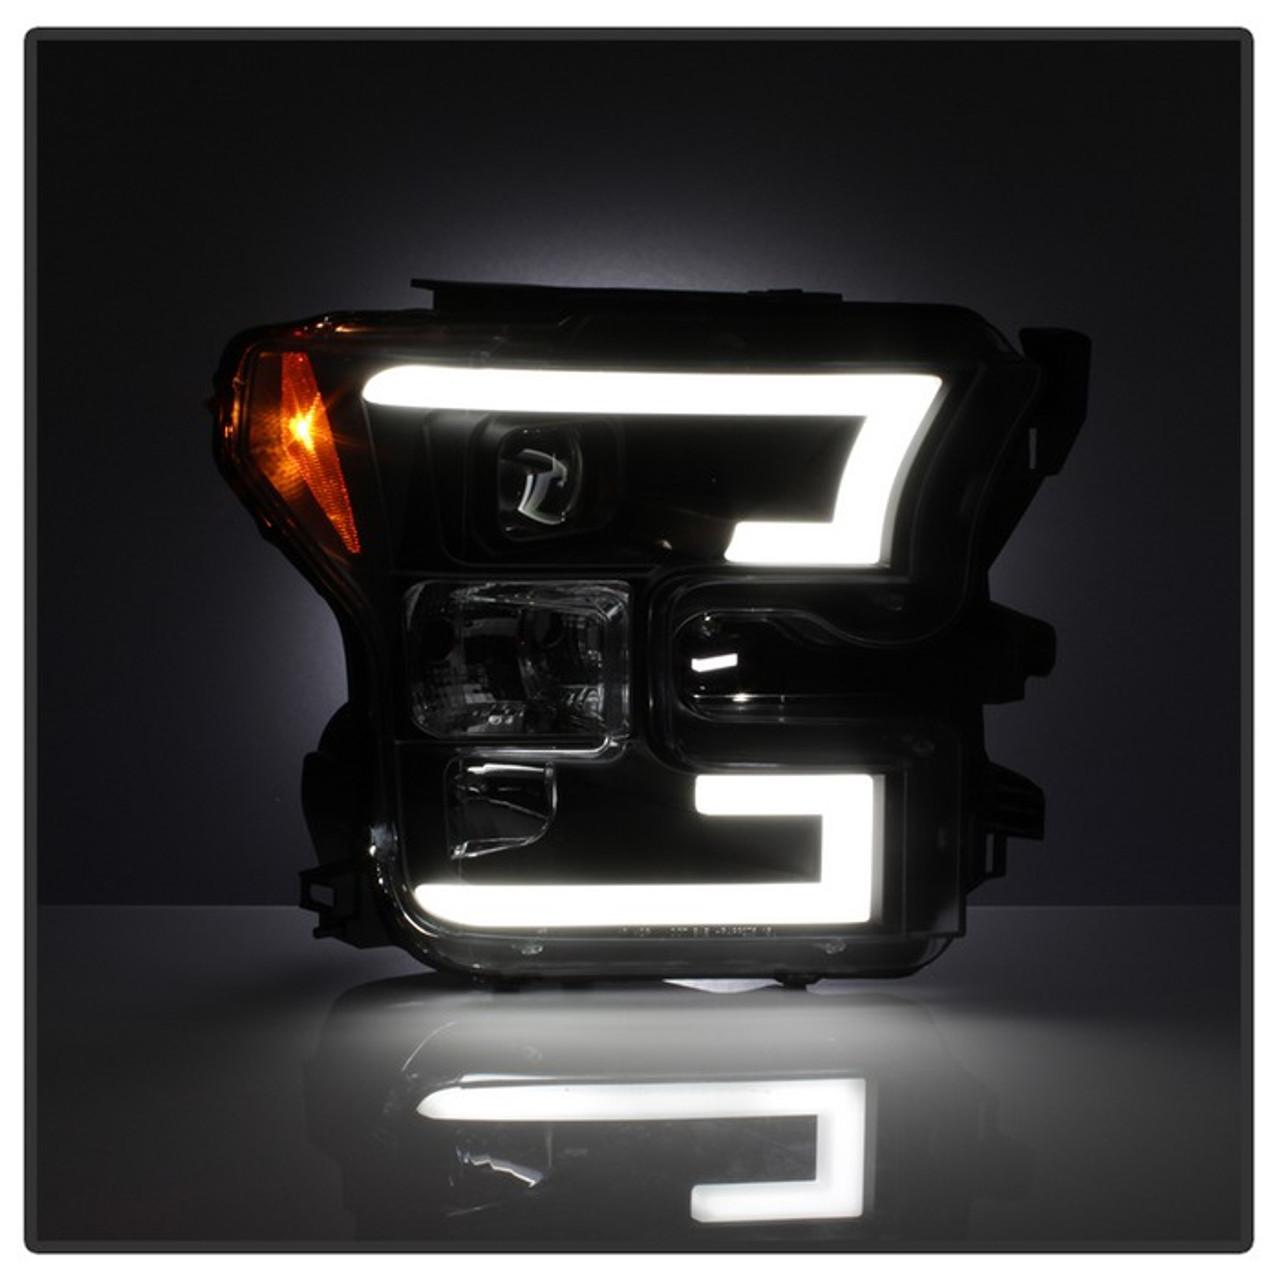 Spyder 2015 2017 Ford F 150 Led Light Bar Projector Headlights Black